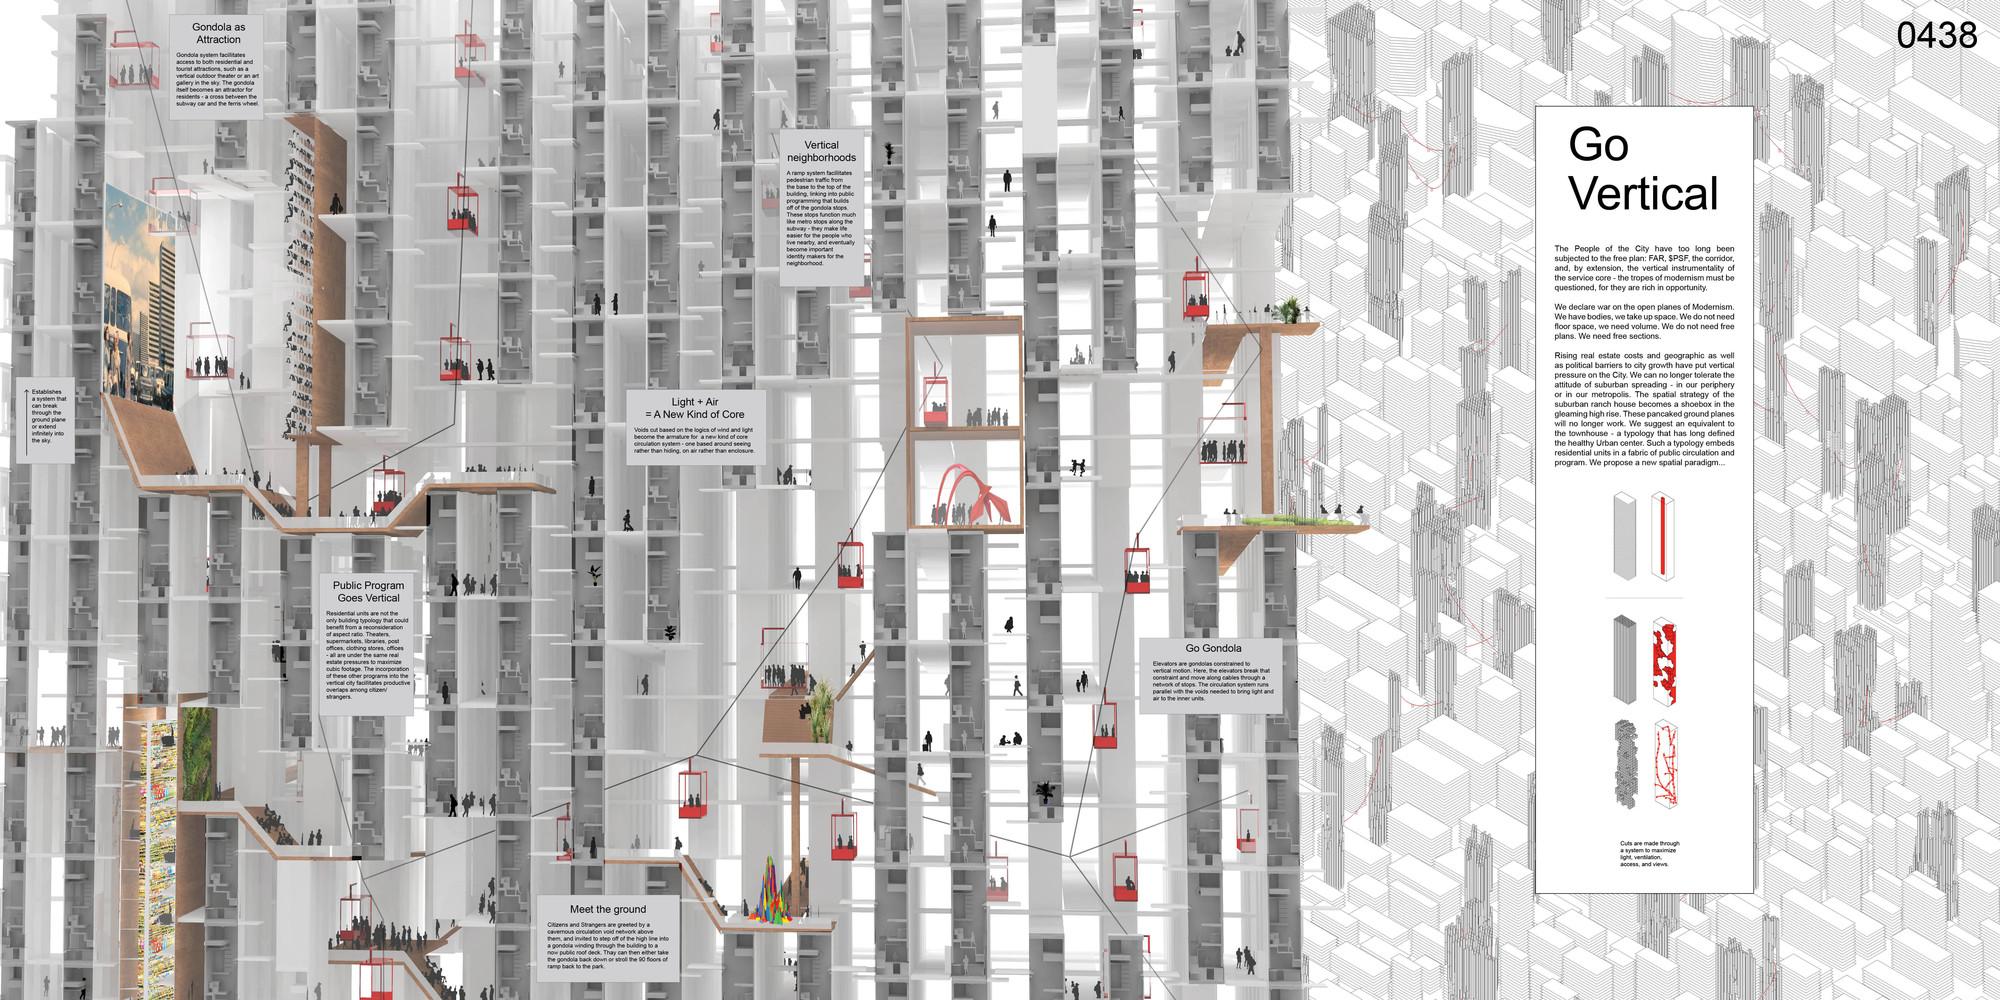 Go Vertical: A City Designed for Volume / Margaret Rew, Taylor Hewett, Karilyn Johannesen. Imagen cortesía de eVolo